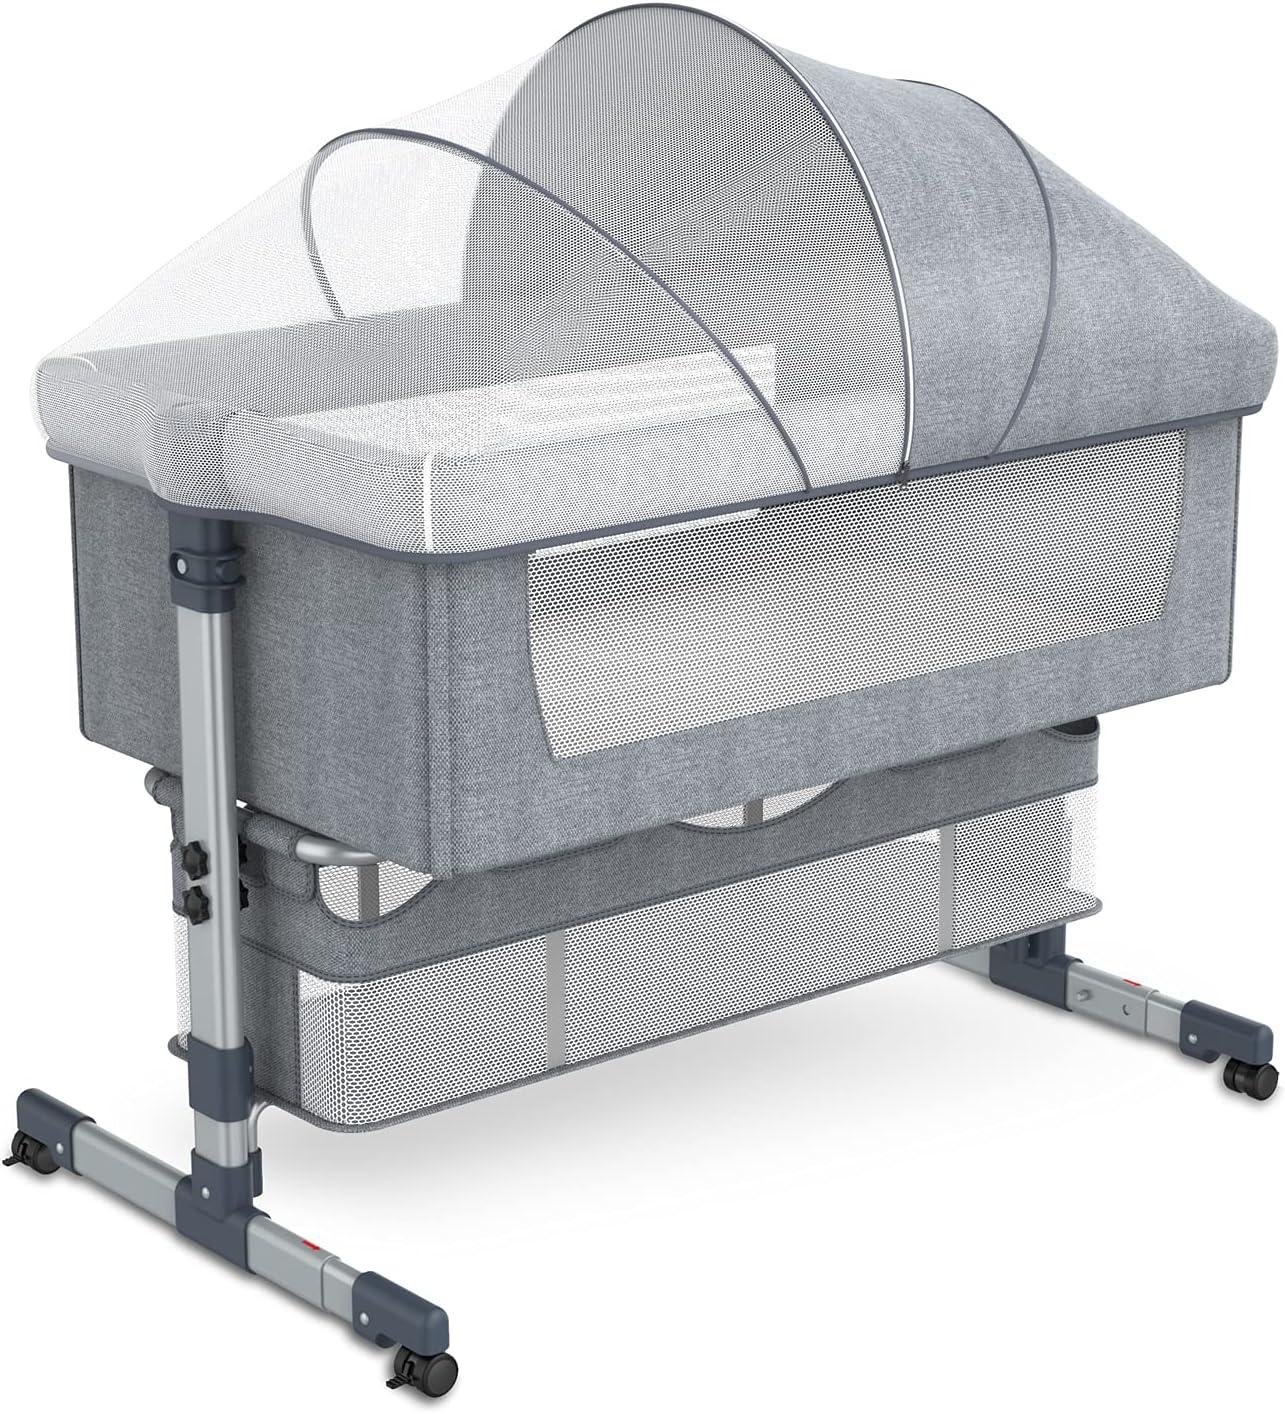 Baby Bedside Crib Bedside Sleeper, Adjustable Portable Travel Baby Crib Sleeper Bed Side Bassinet w/Carrying Bag, Portable Newborn Bassinet to Infant, Detachable Mattress, Height & Angle Adjustable